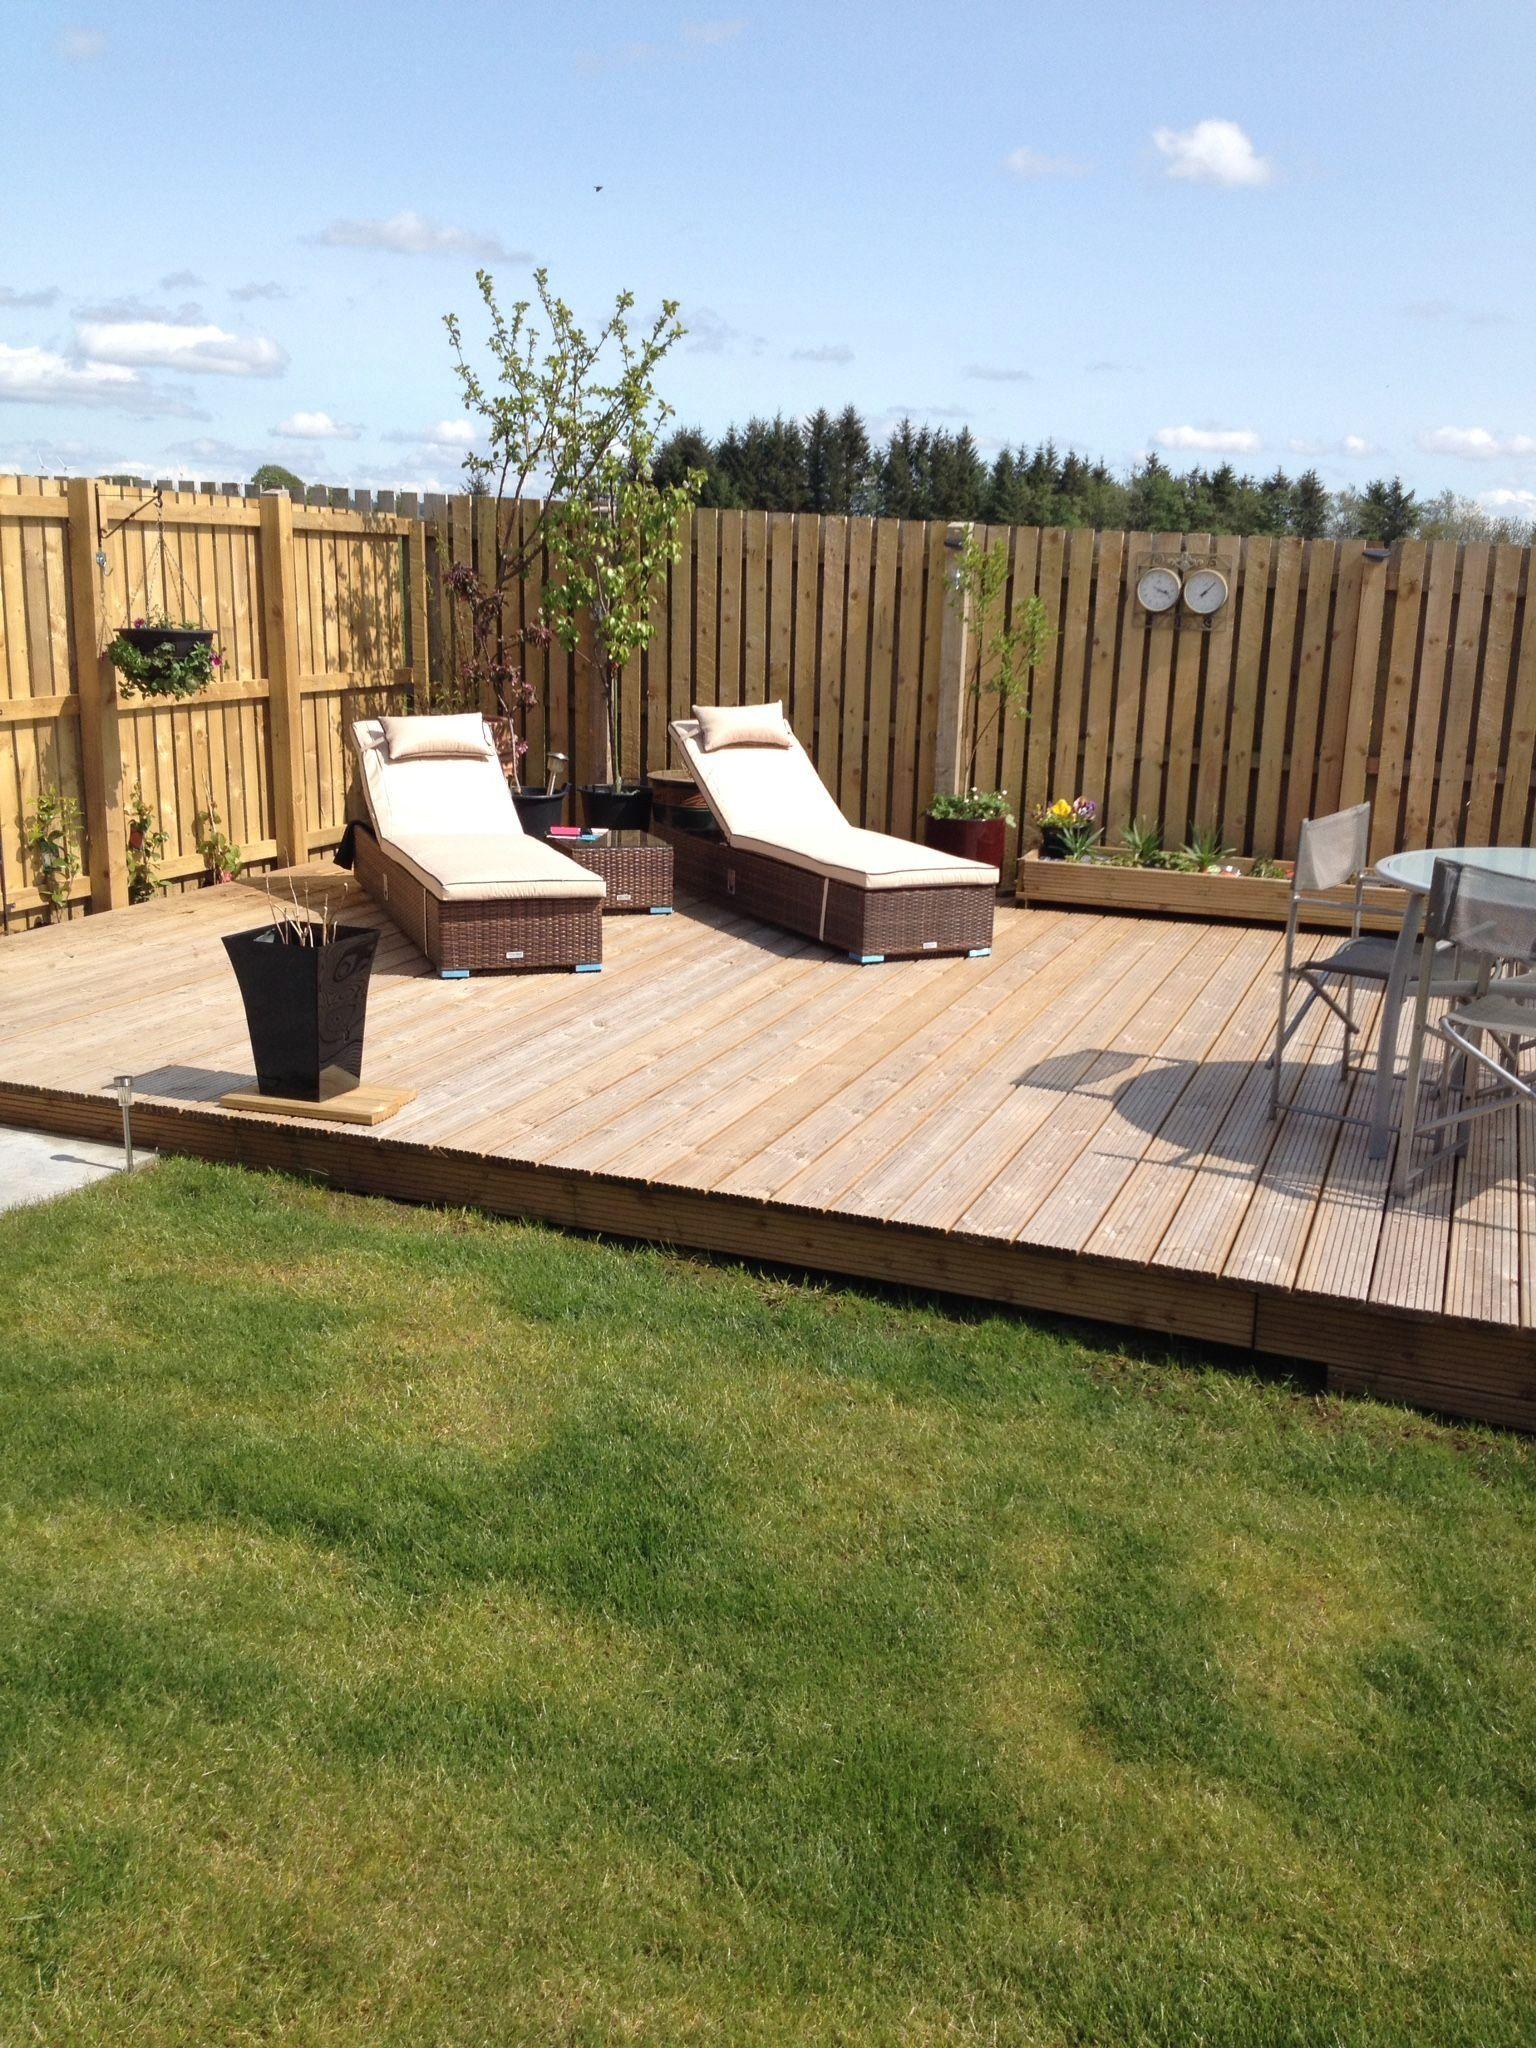 24 May 2016 My Garden Modern Design Modern Backyard Landscaping Deck Designs Backyard Backyard Patio Designs